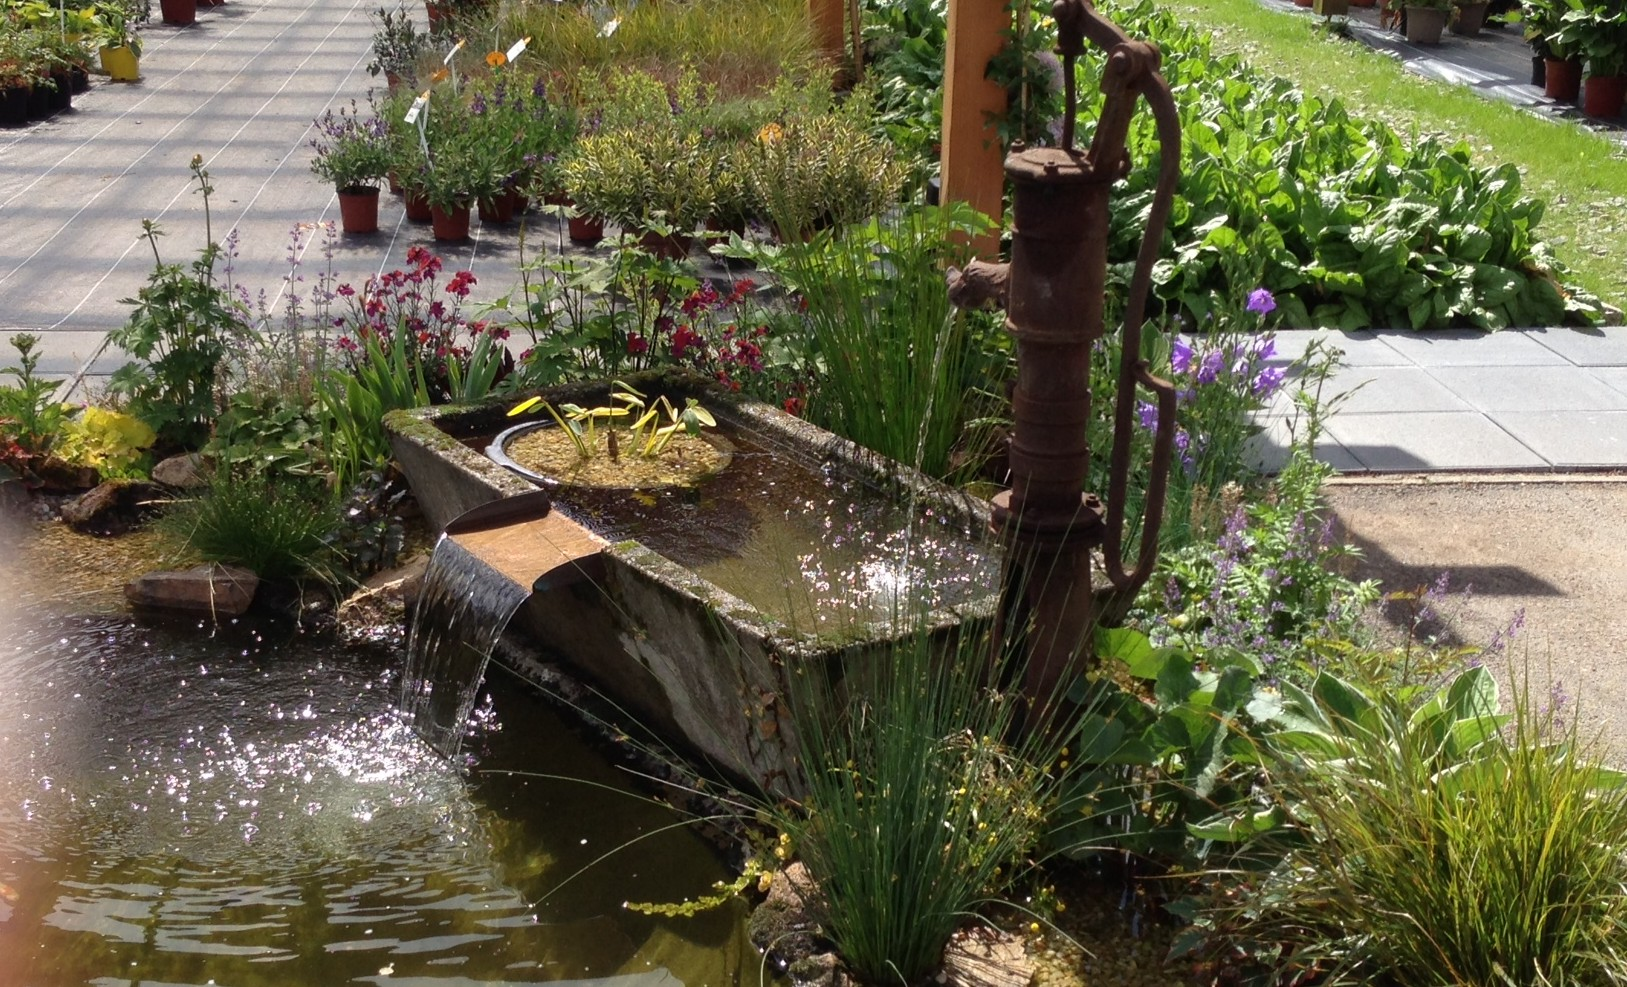 Bassin des jardins de vanteaux 87 arrolimousin for Bassin de jardin d occasion